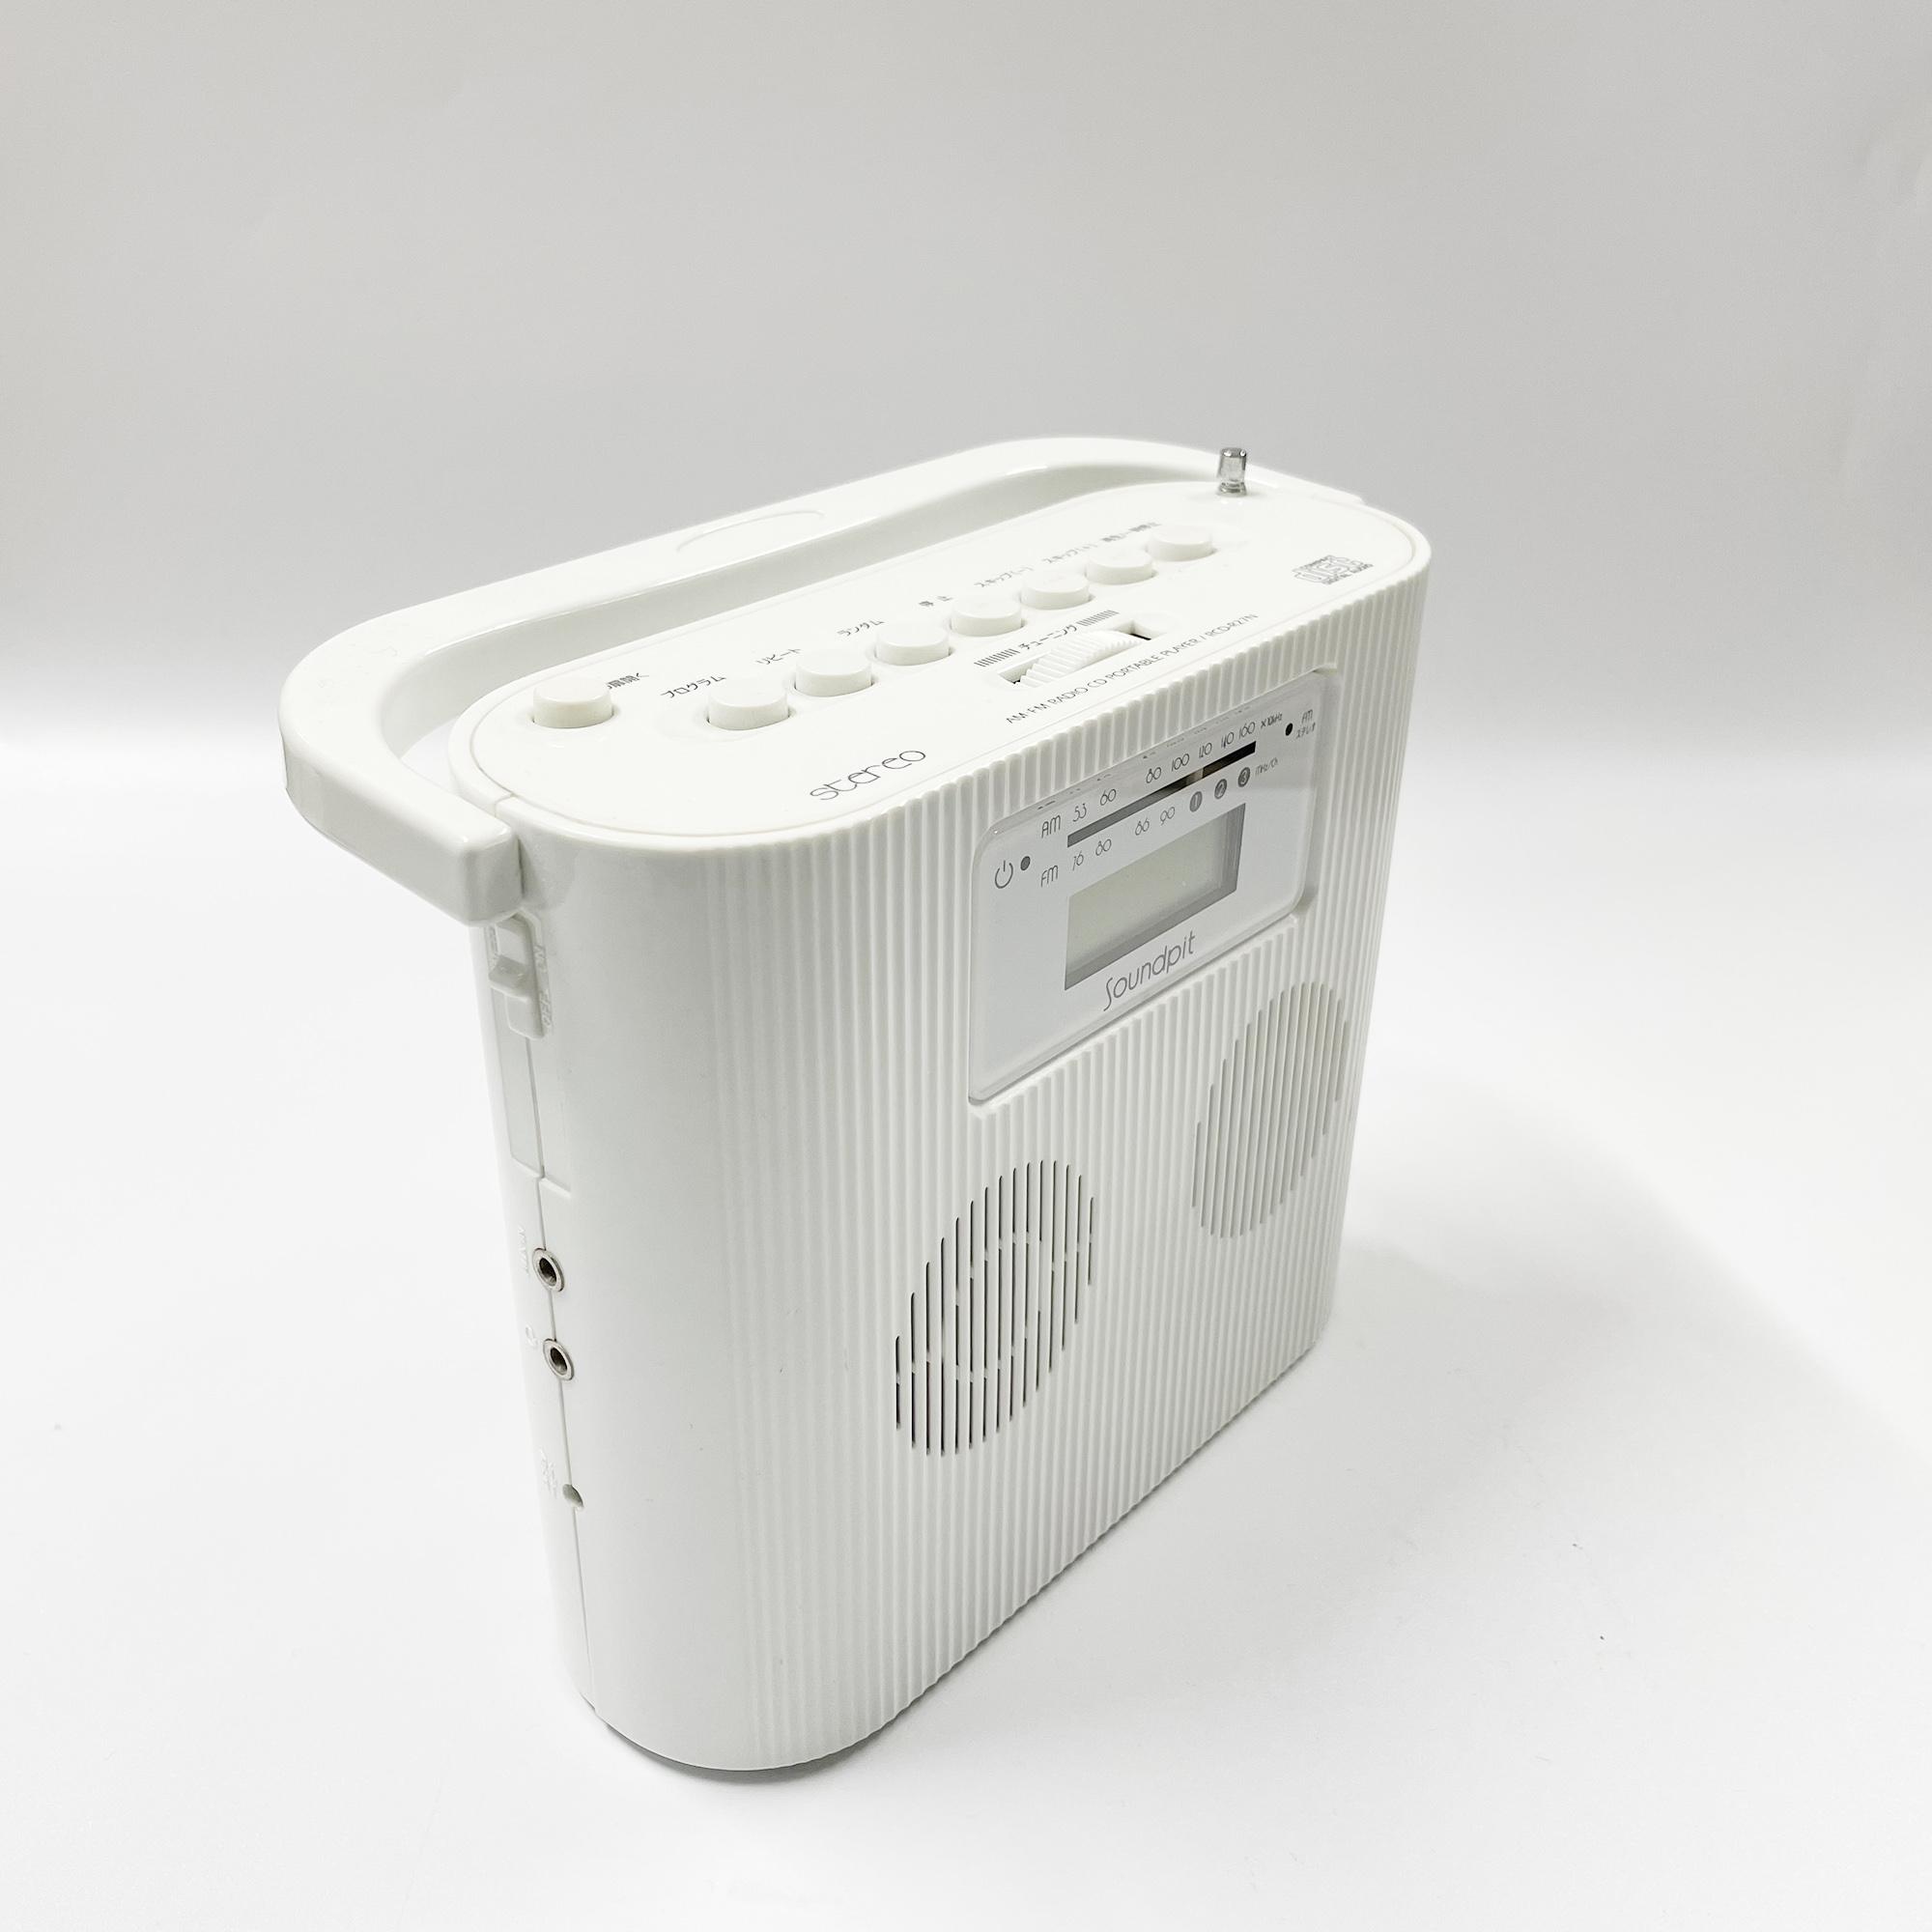 EL0065